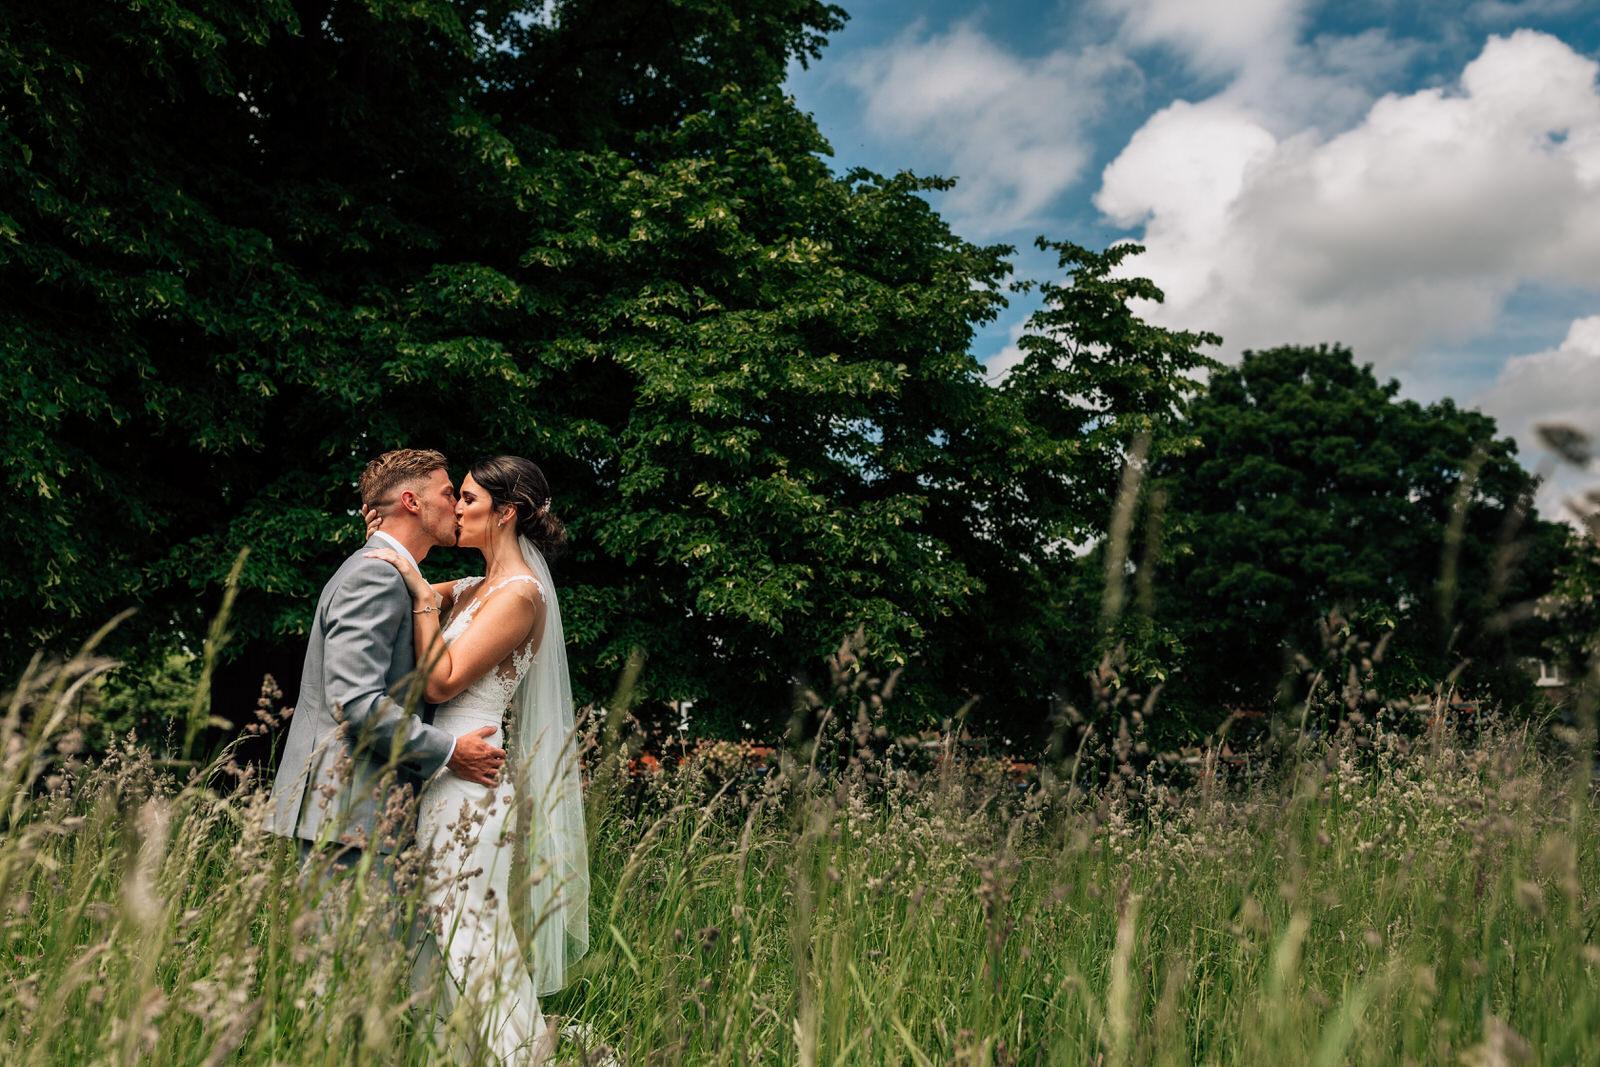 Home counties wedding photography by Damion Mower on English-Wedding.com (8)